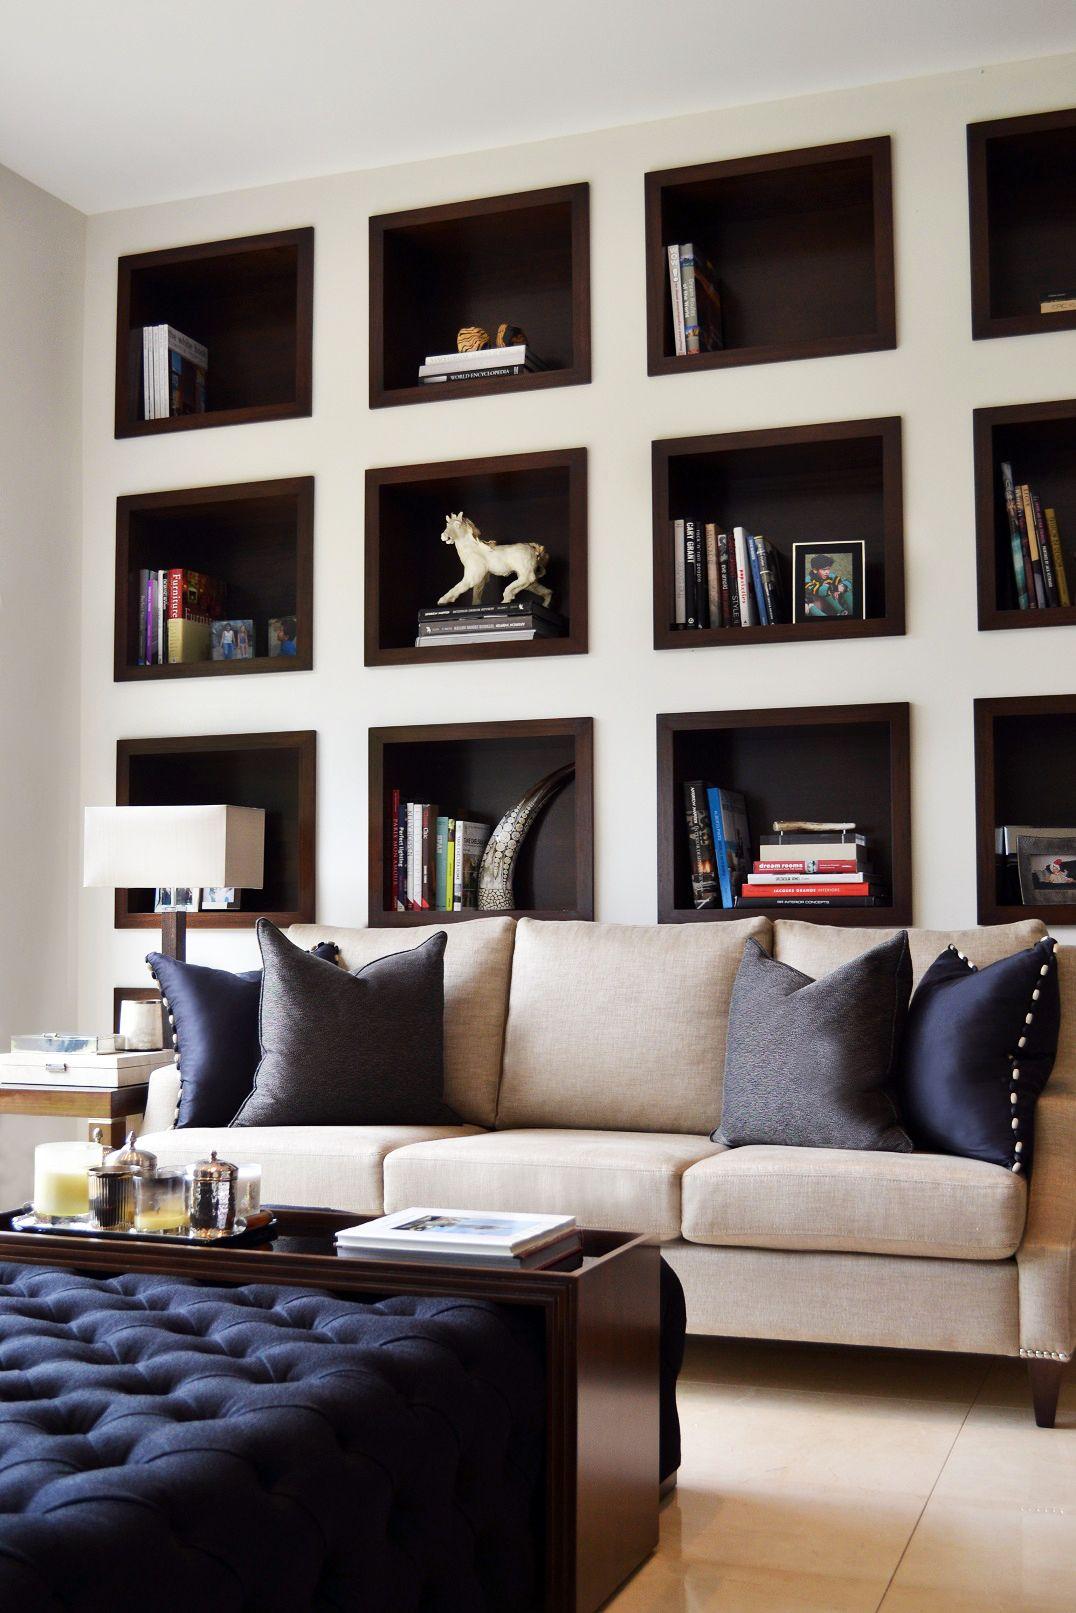 Unique Living Room Decorating Ideas: Unique Ways To Style Bookshelves